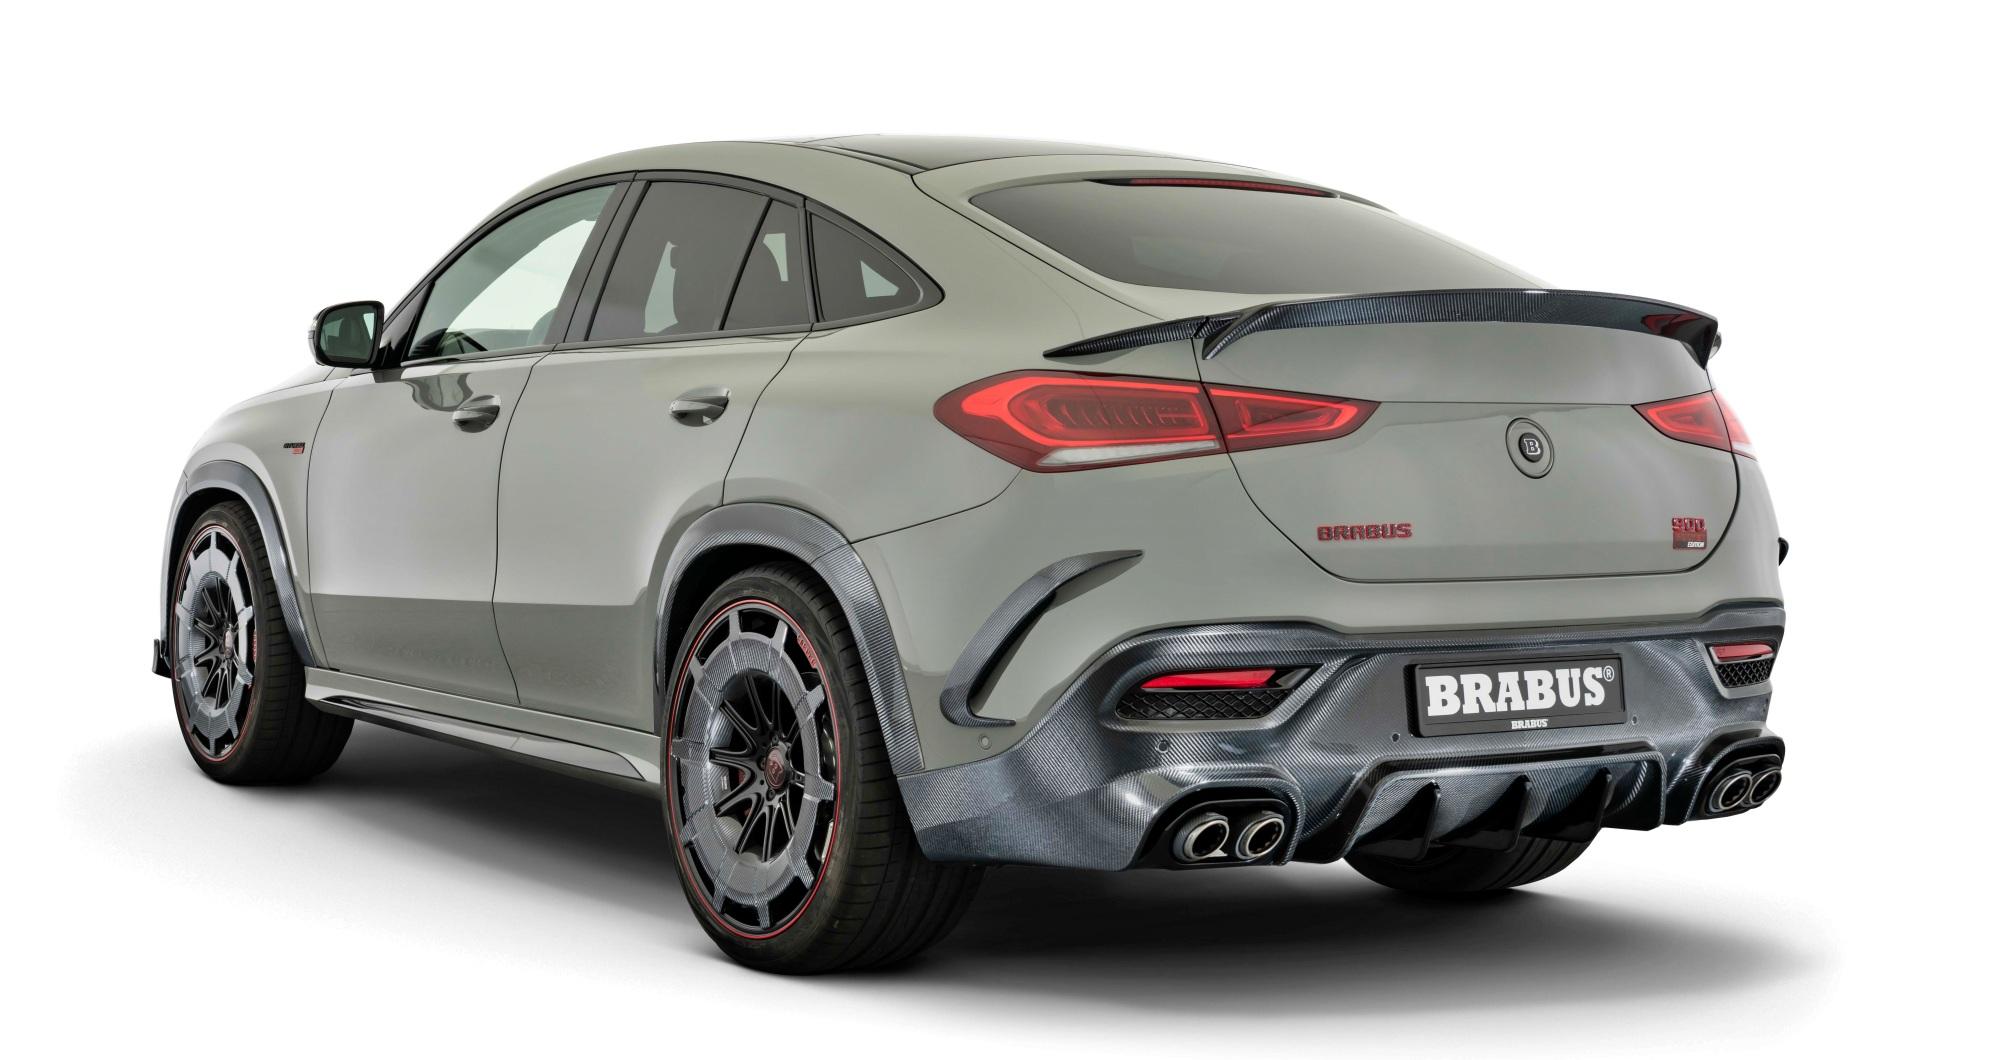 Brabus 900 Rocket Edition